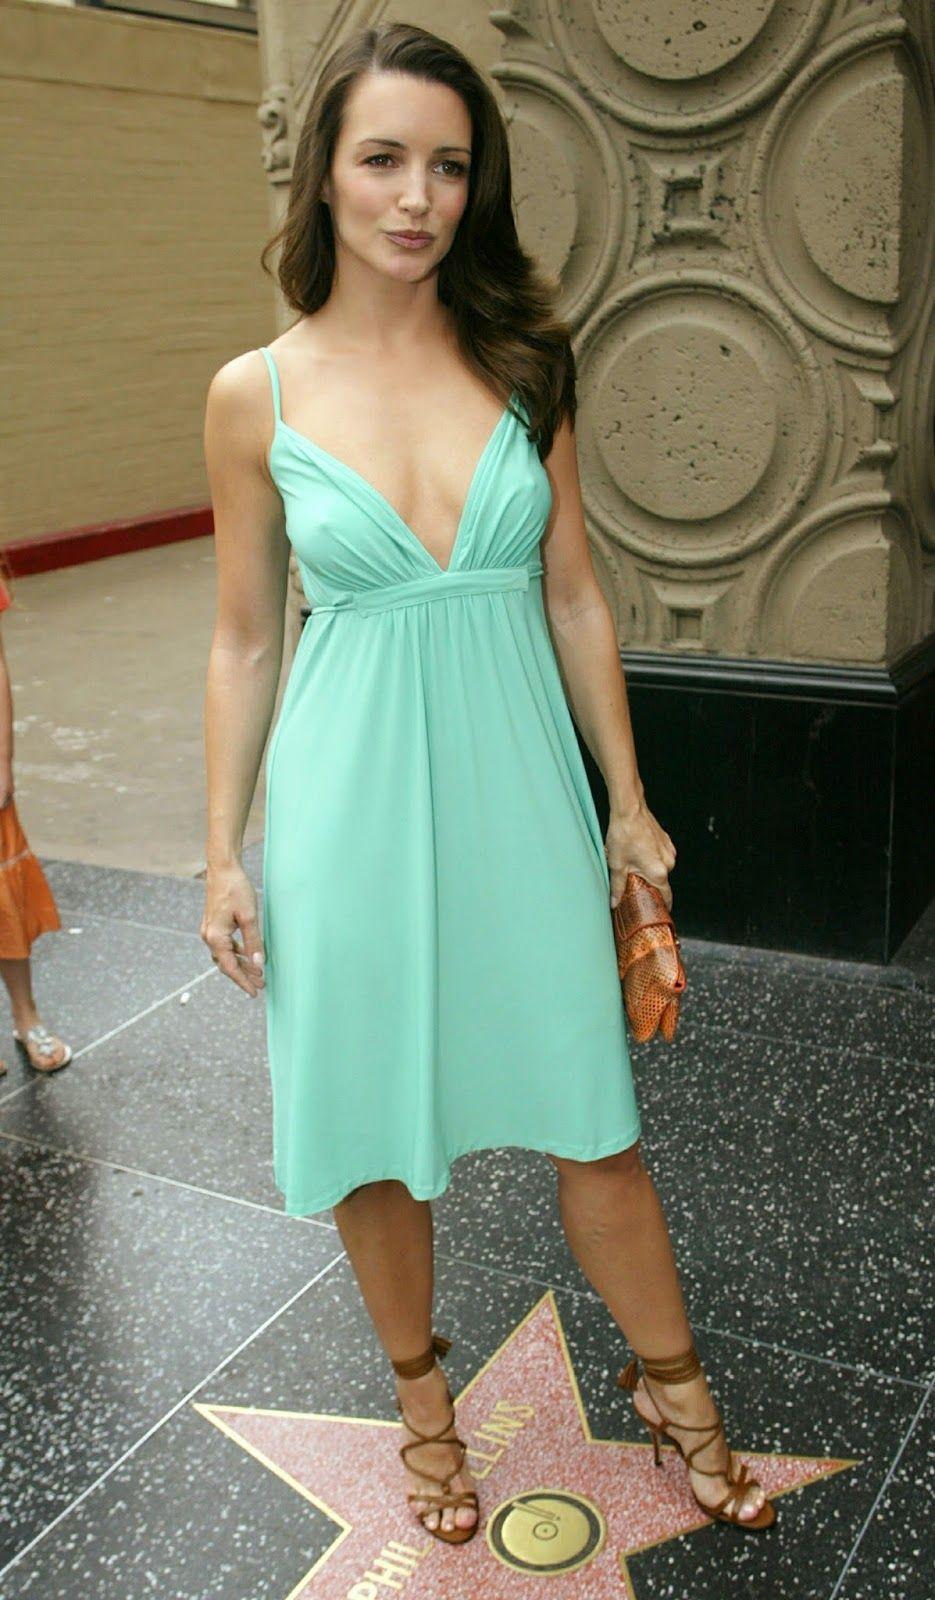 Kristin+Davis+pokies+in+braless+green+dress+2 | Easy On The Eyes ...